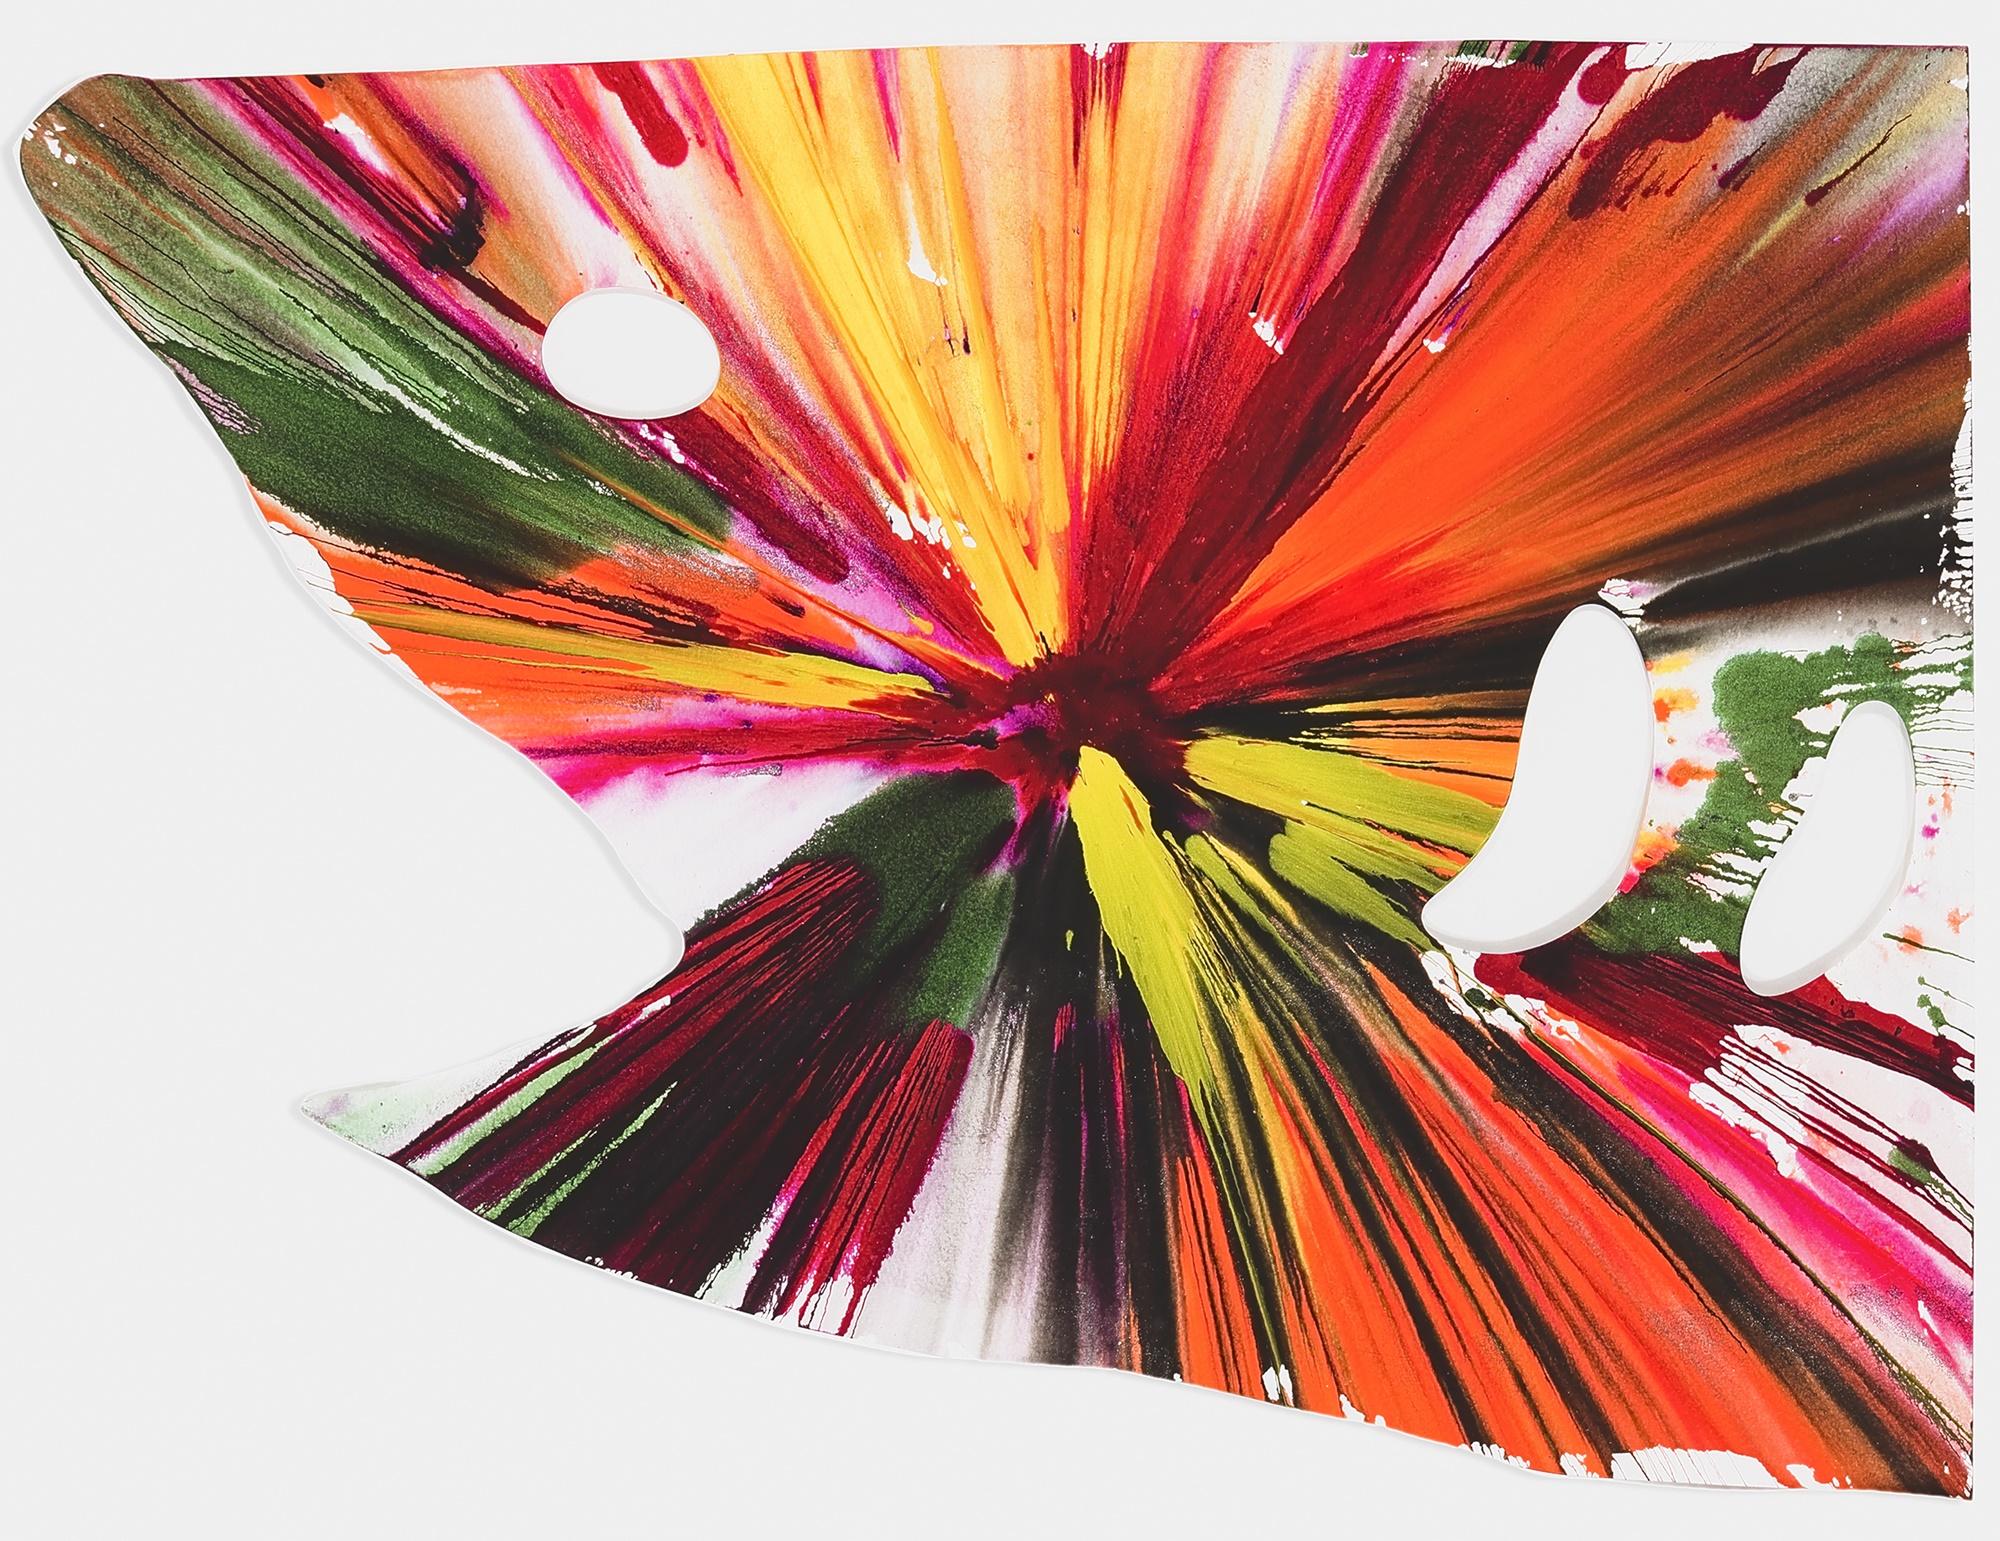 Damien Hirst (British 1965-), 'Shark Spin Painting', 2009